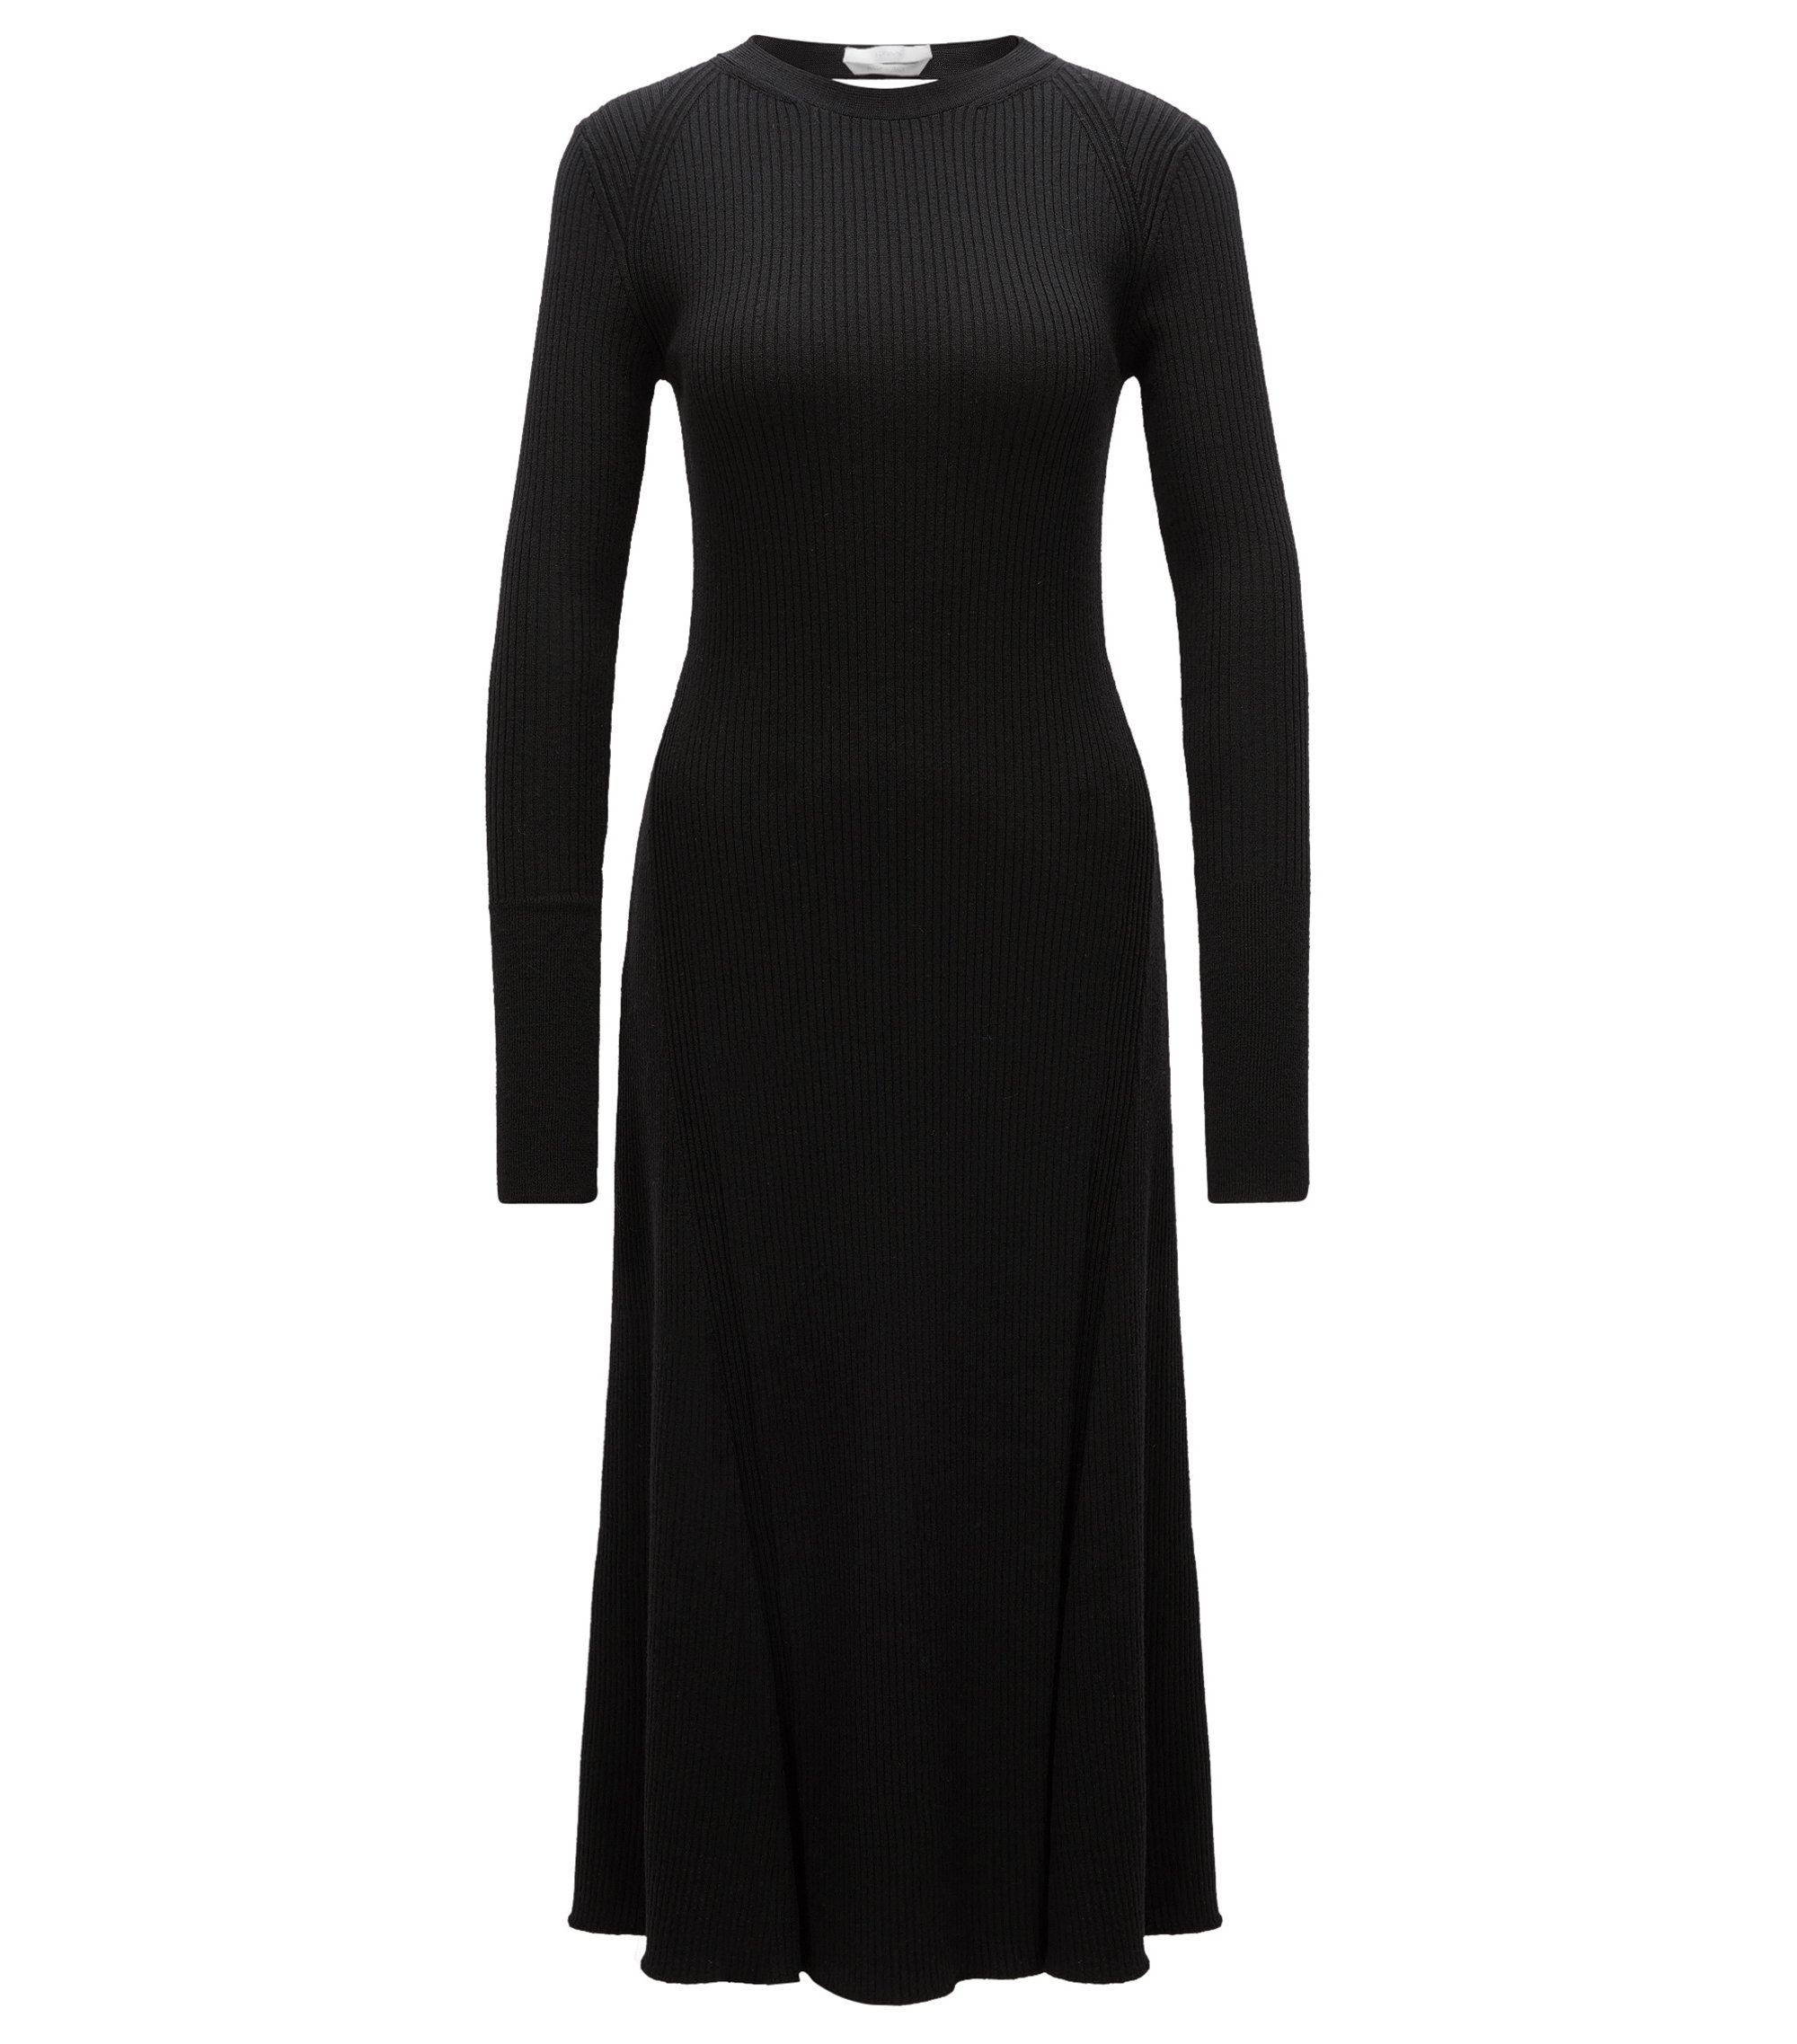 Ribbed Stretch Virgin Wool Dress | Faustine, Black